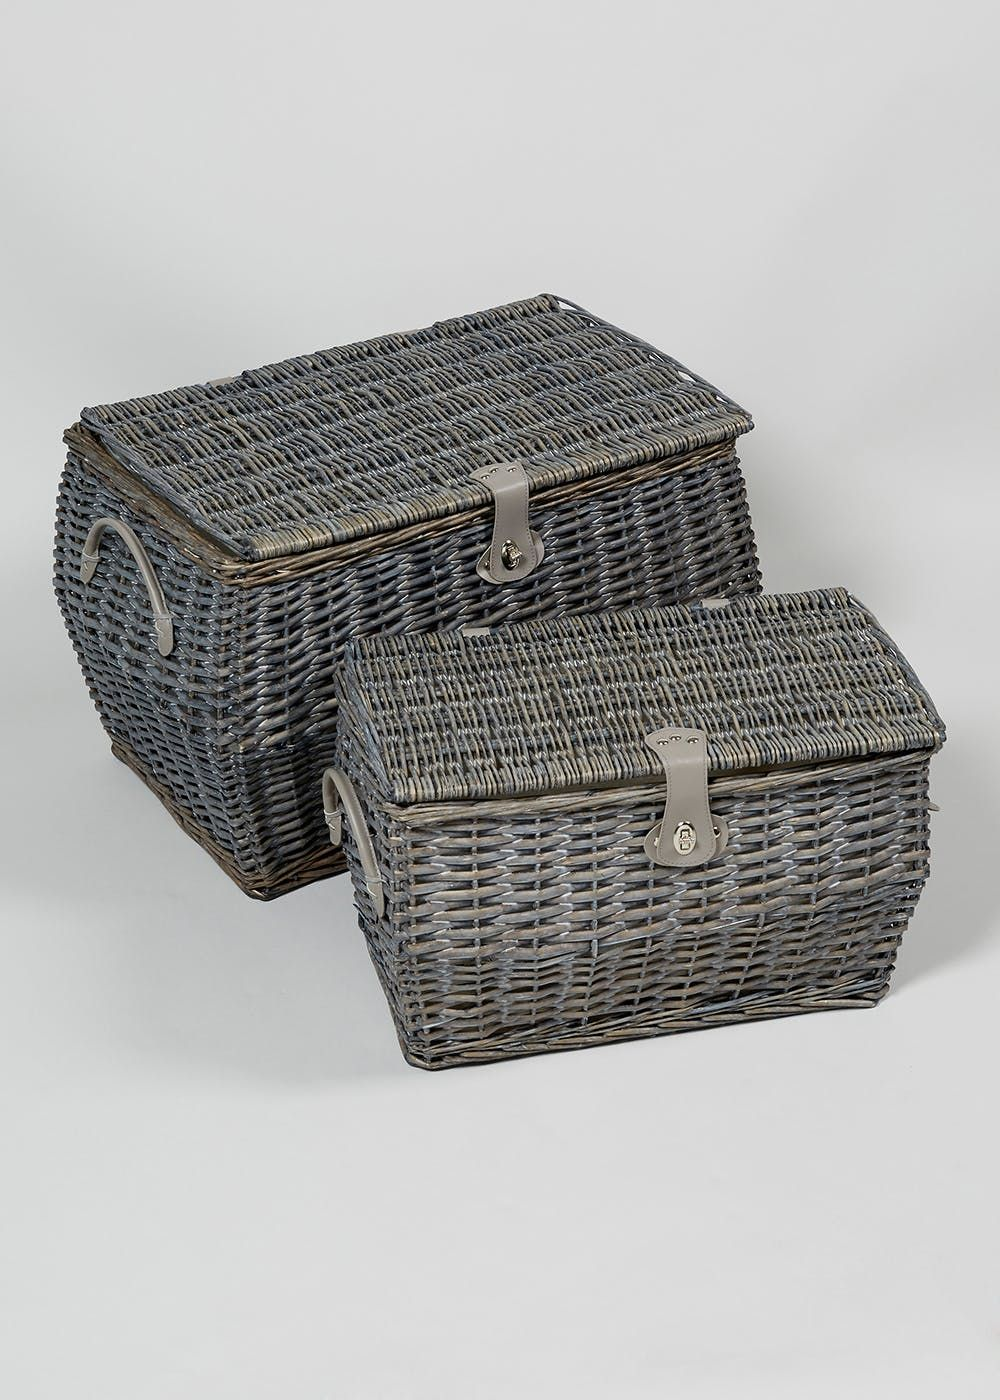 2 pack will baskets 58cm x 40cm x 40cm  grey  basket